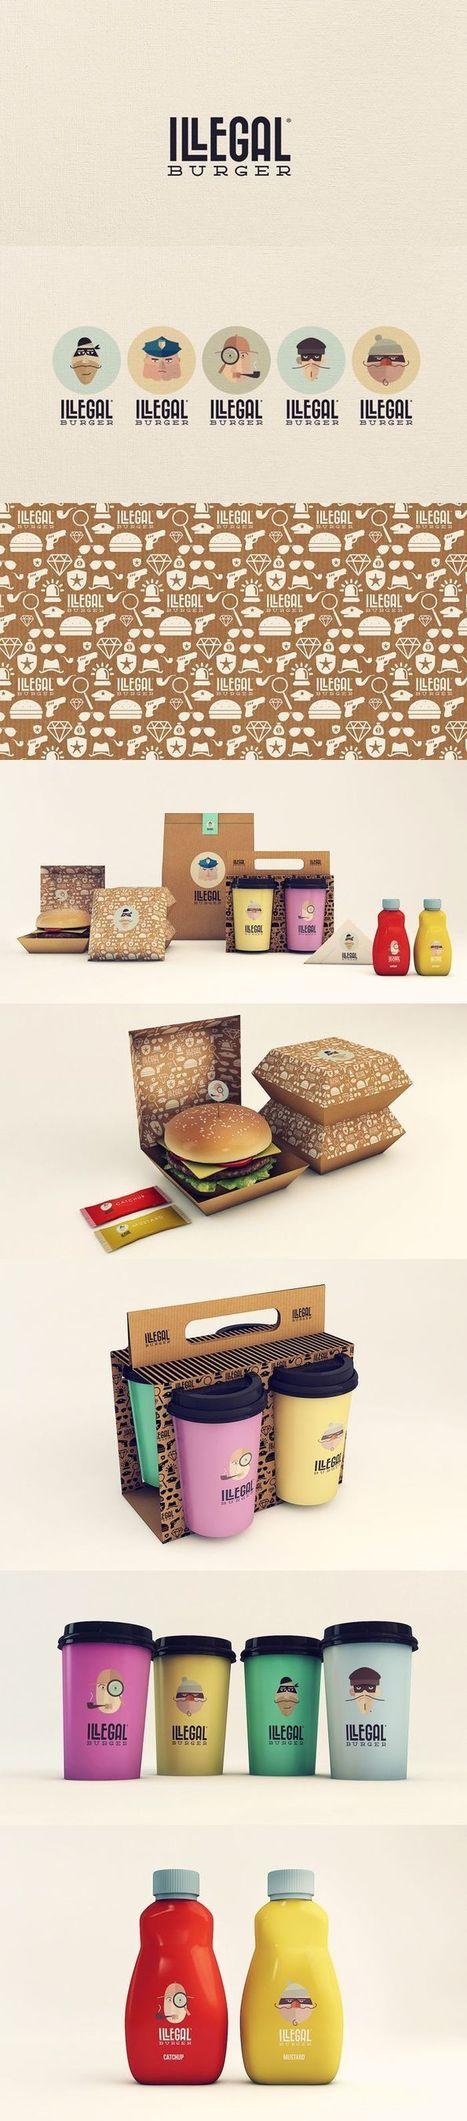 Illegal Burger Bar packaging Design - Inspiration DE | ChefCentral | Scoop.it